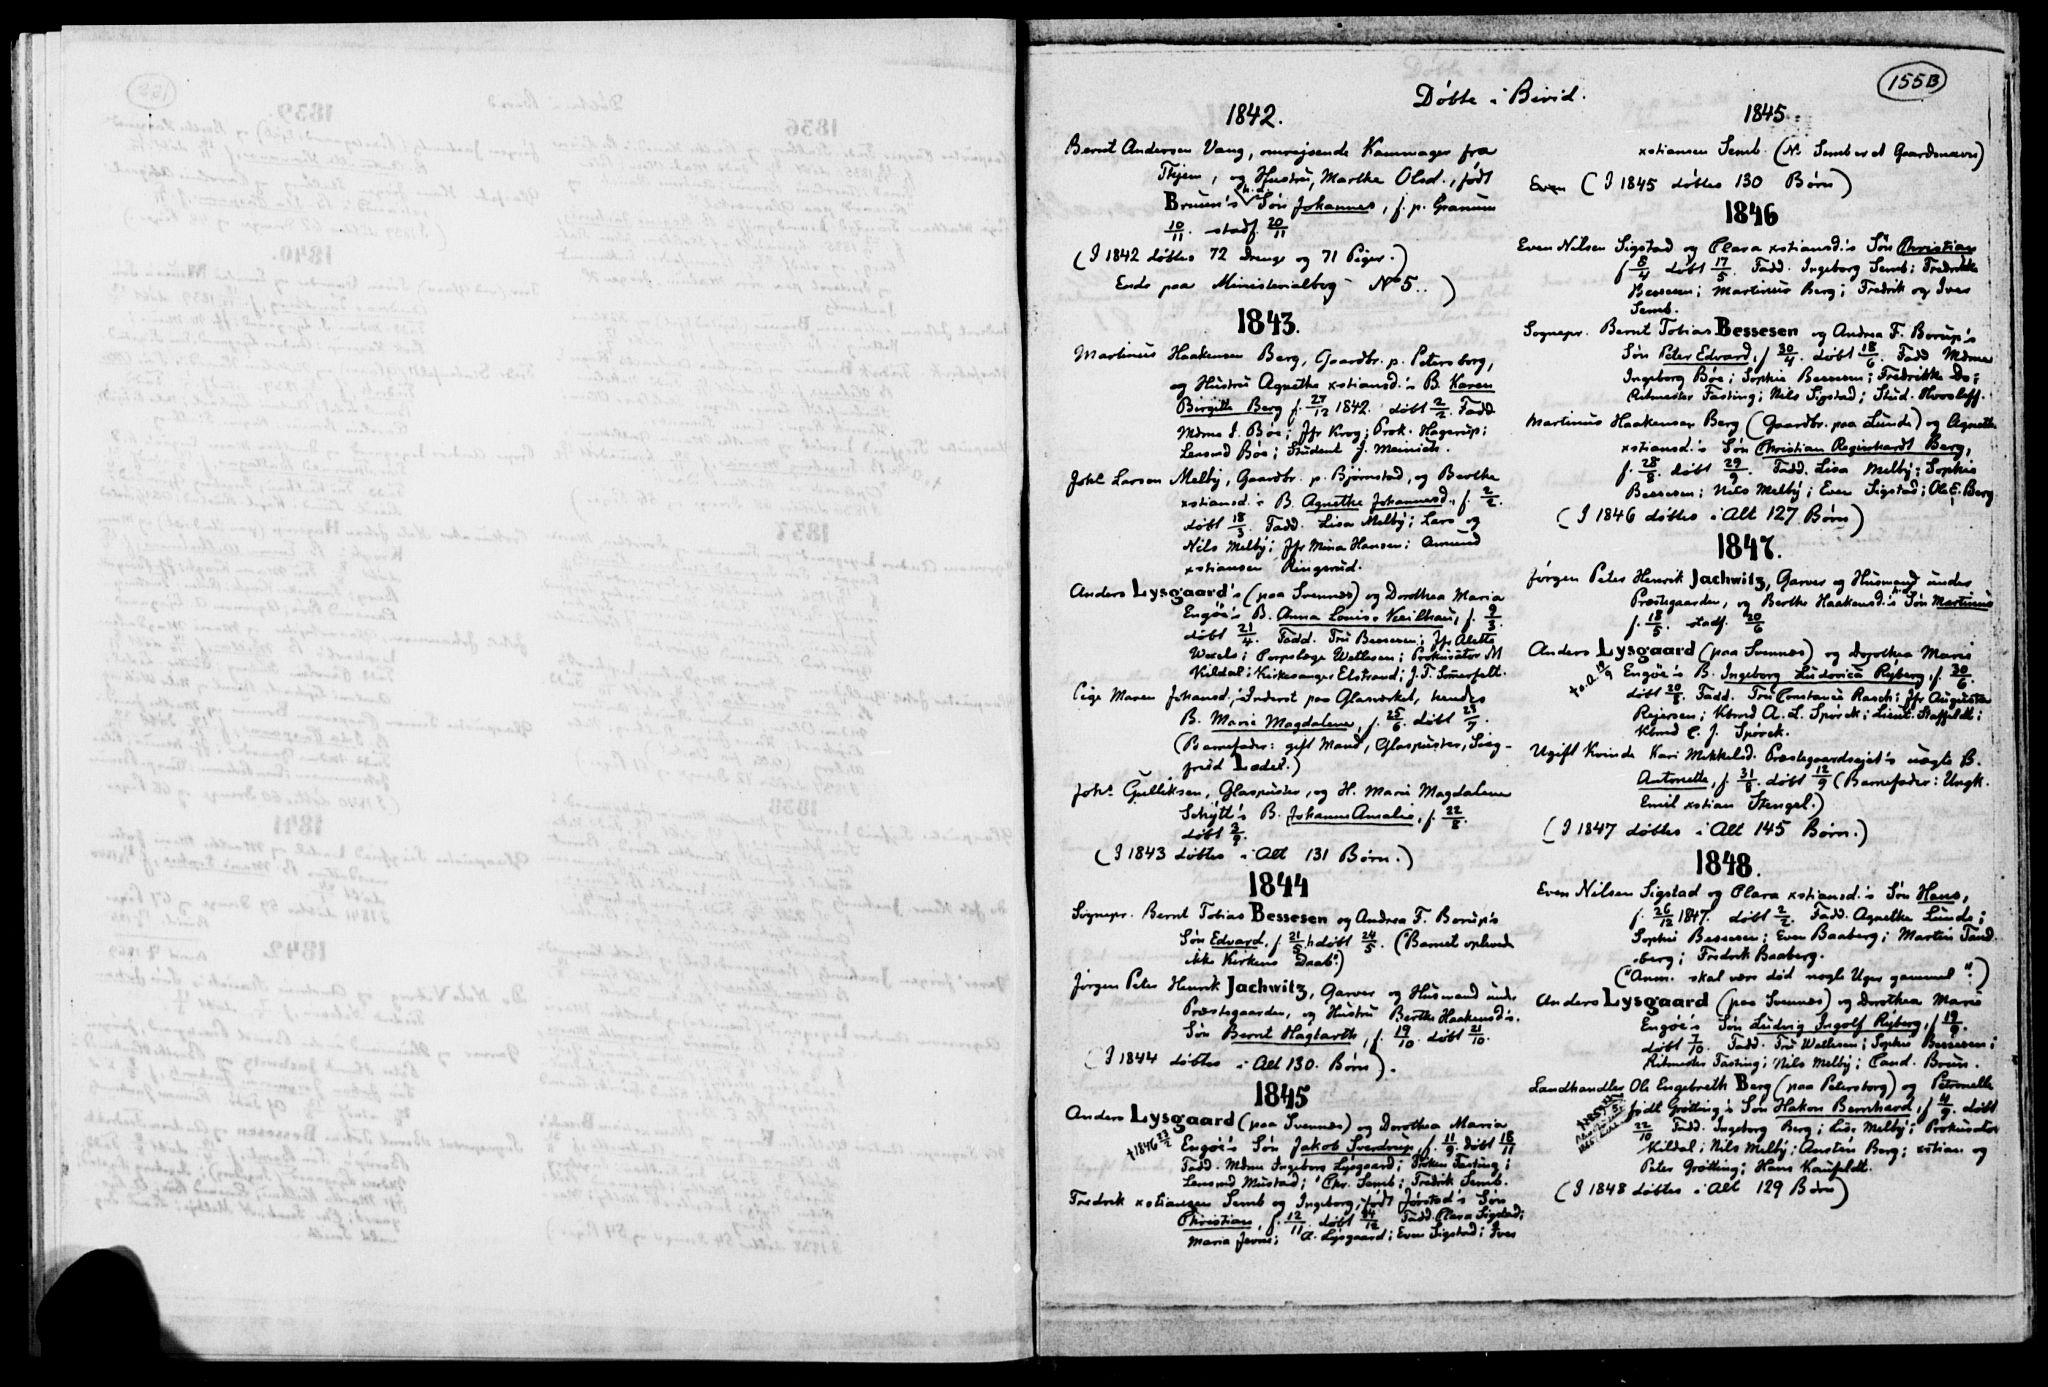 SAH, Biri prestekontor, Ministerialbok, 1730-1879, s. 155b